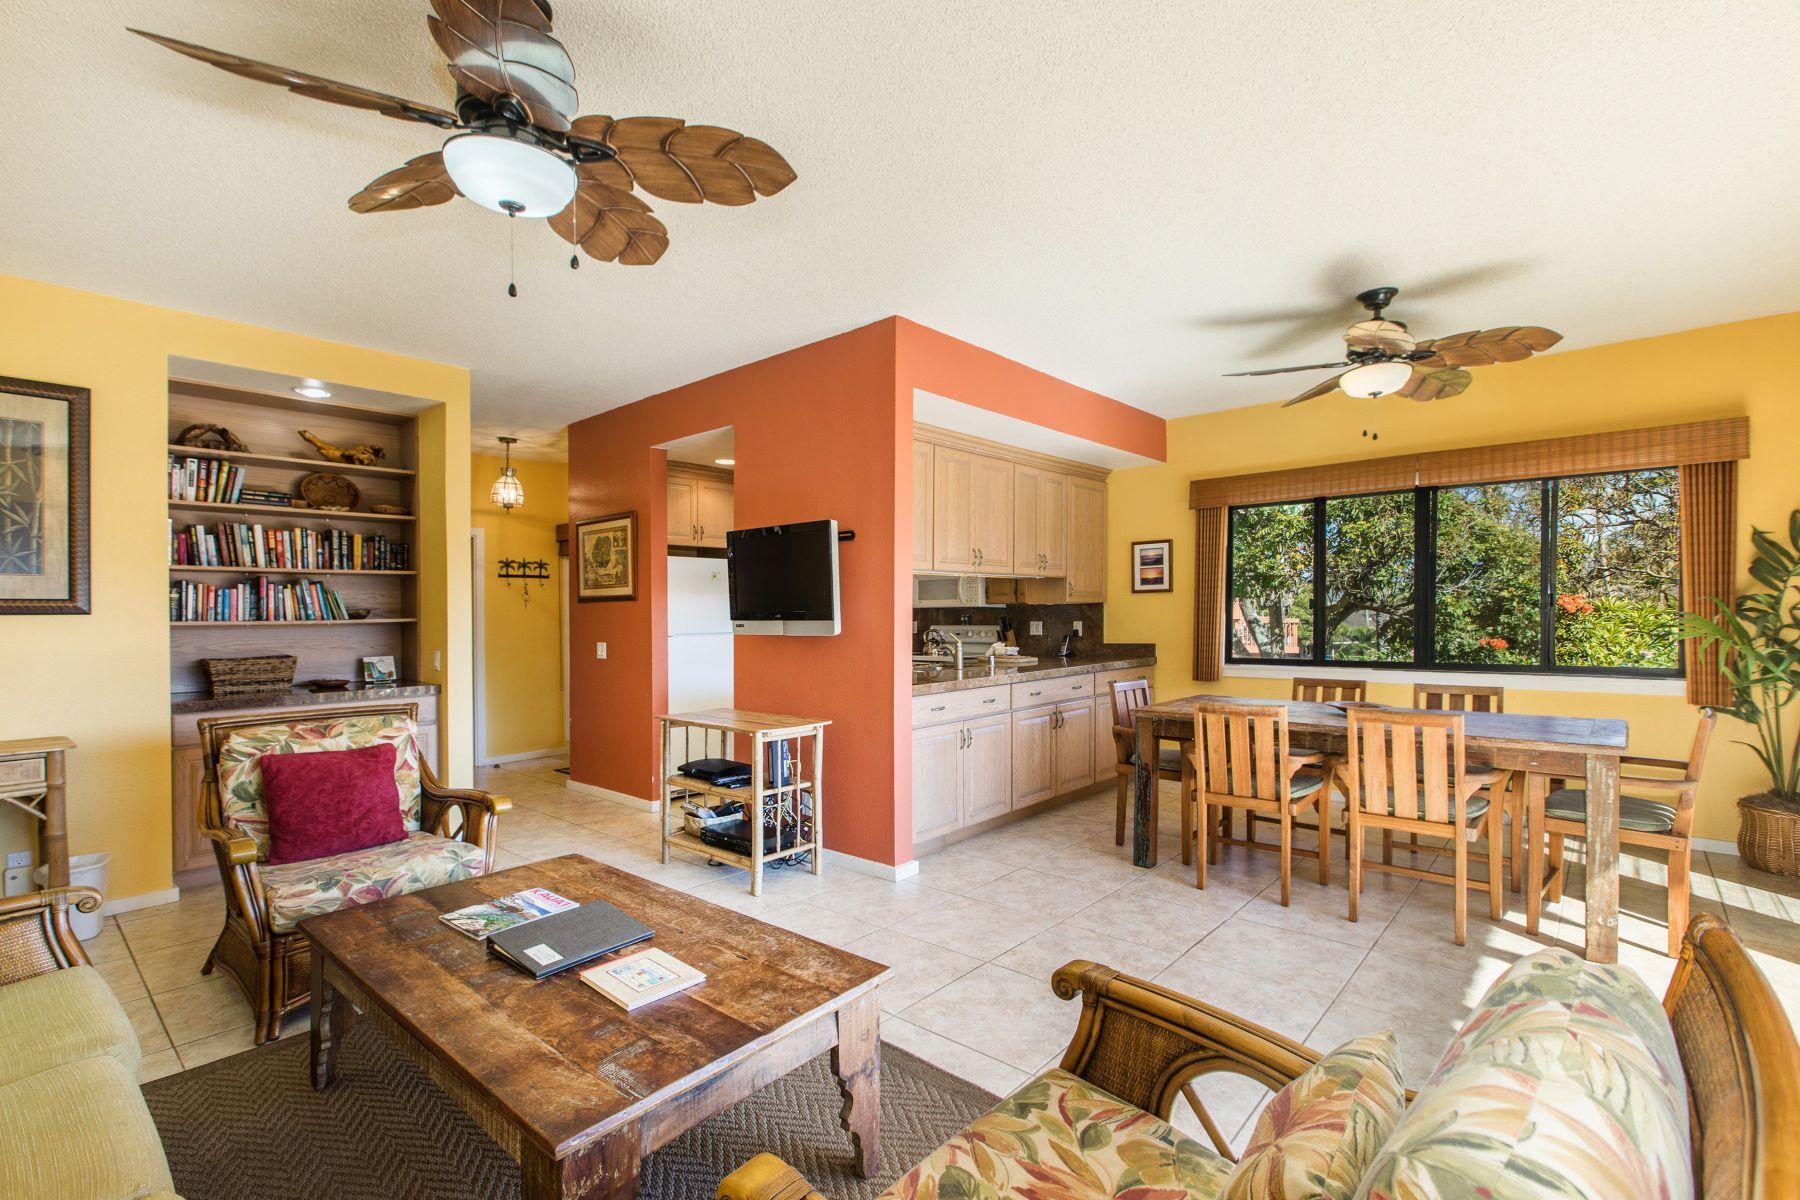 Condominium for Sale at Rare and Completely Detached Condominium with Two Car Garage in Koloa, Kauai 2370 Ho'ohu Road #311 Koloa, Hawaii, 96756 United States